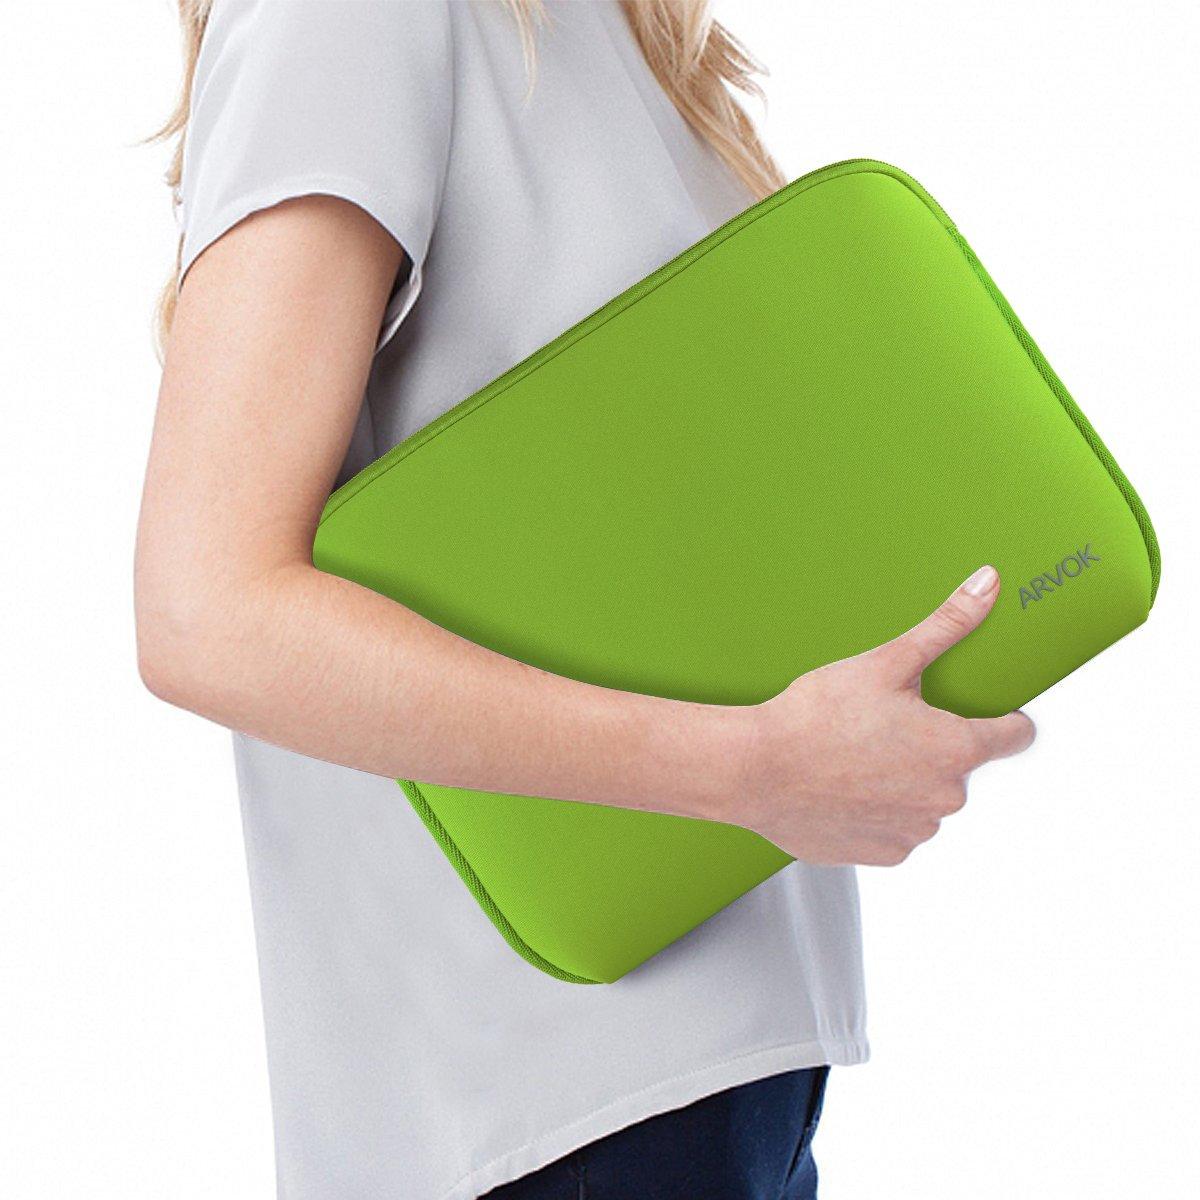 Verde Claro Arvok 15,6 Pulgadas Funda Protectora para Port/átiles//Impermeable Ordenador Port/átil Caso//Neopreno del Port/átil Bolsa para Acer//ASUS//DELL//Fujitsu//Lenovo//HP//Samsung//Sony